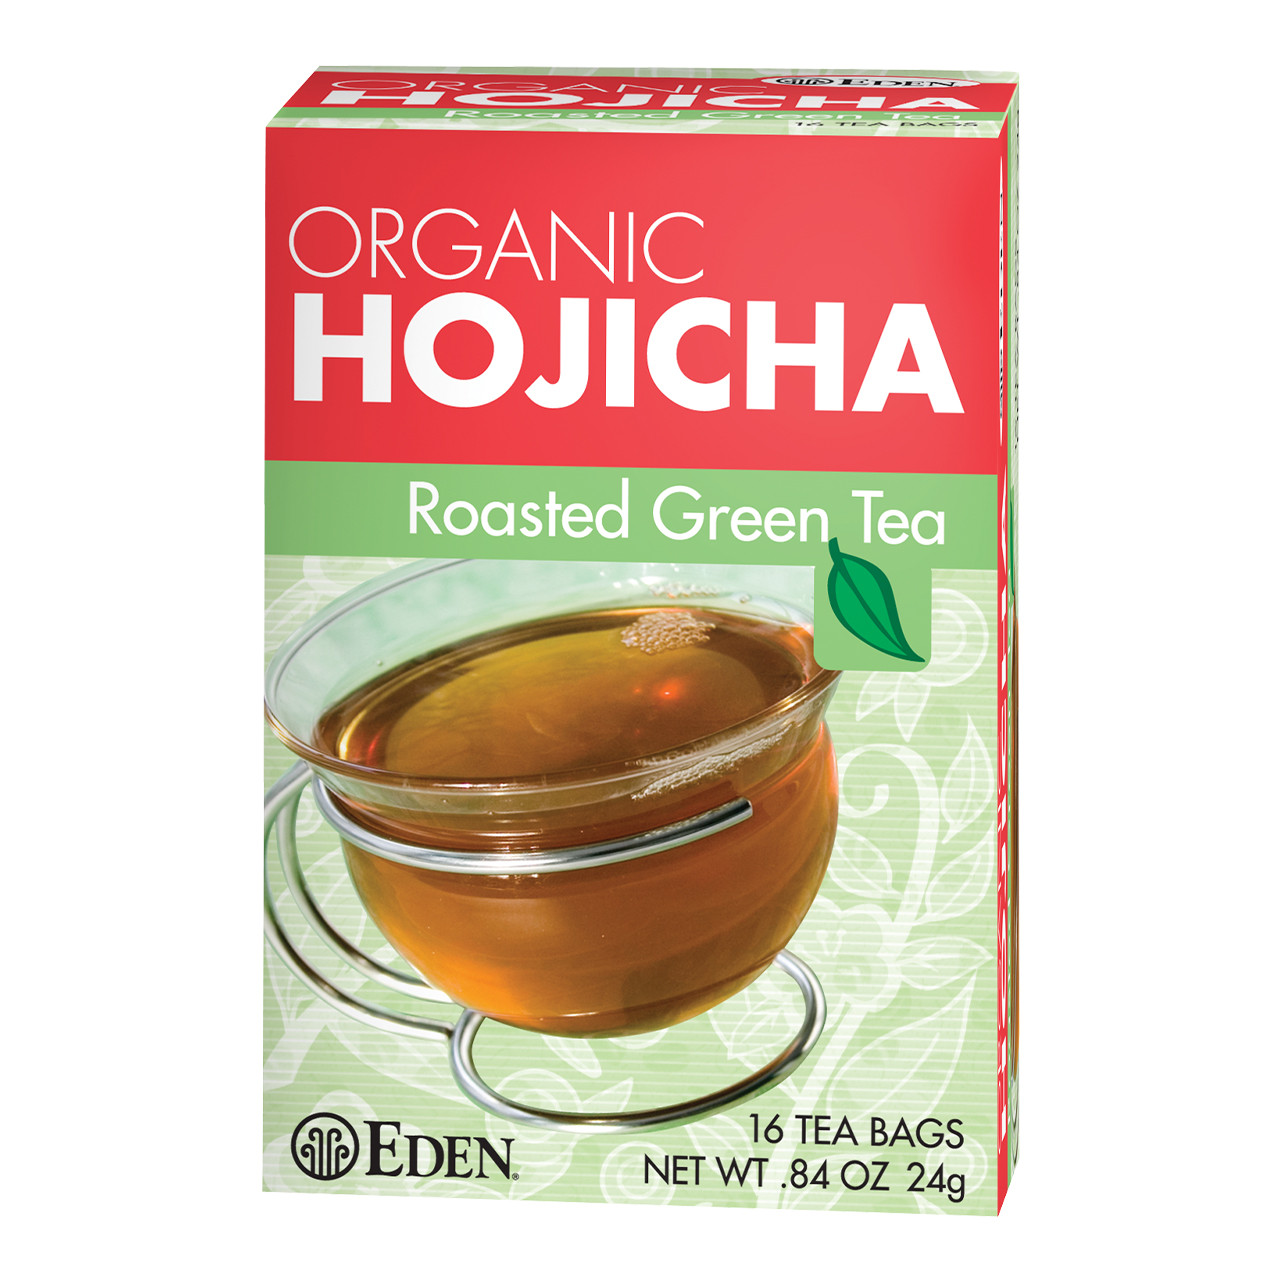 Hojicha Tea, Roasted Green Tea, Organic